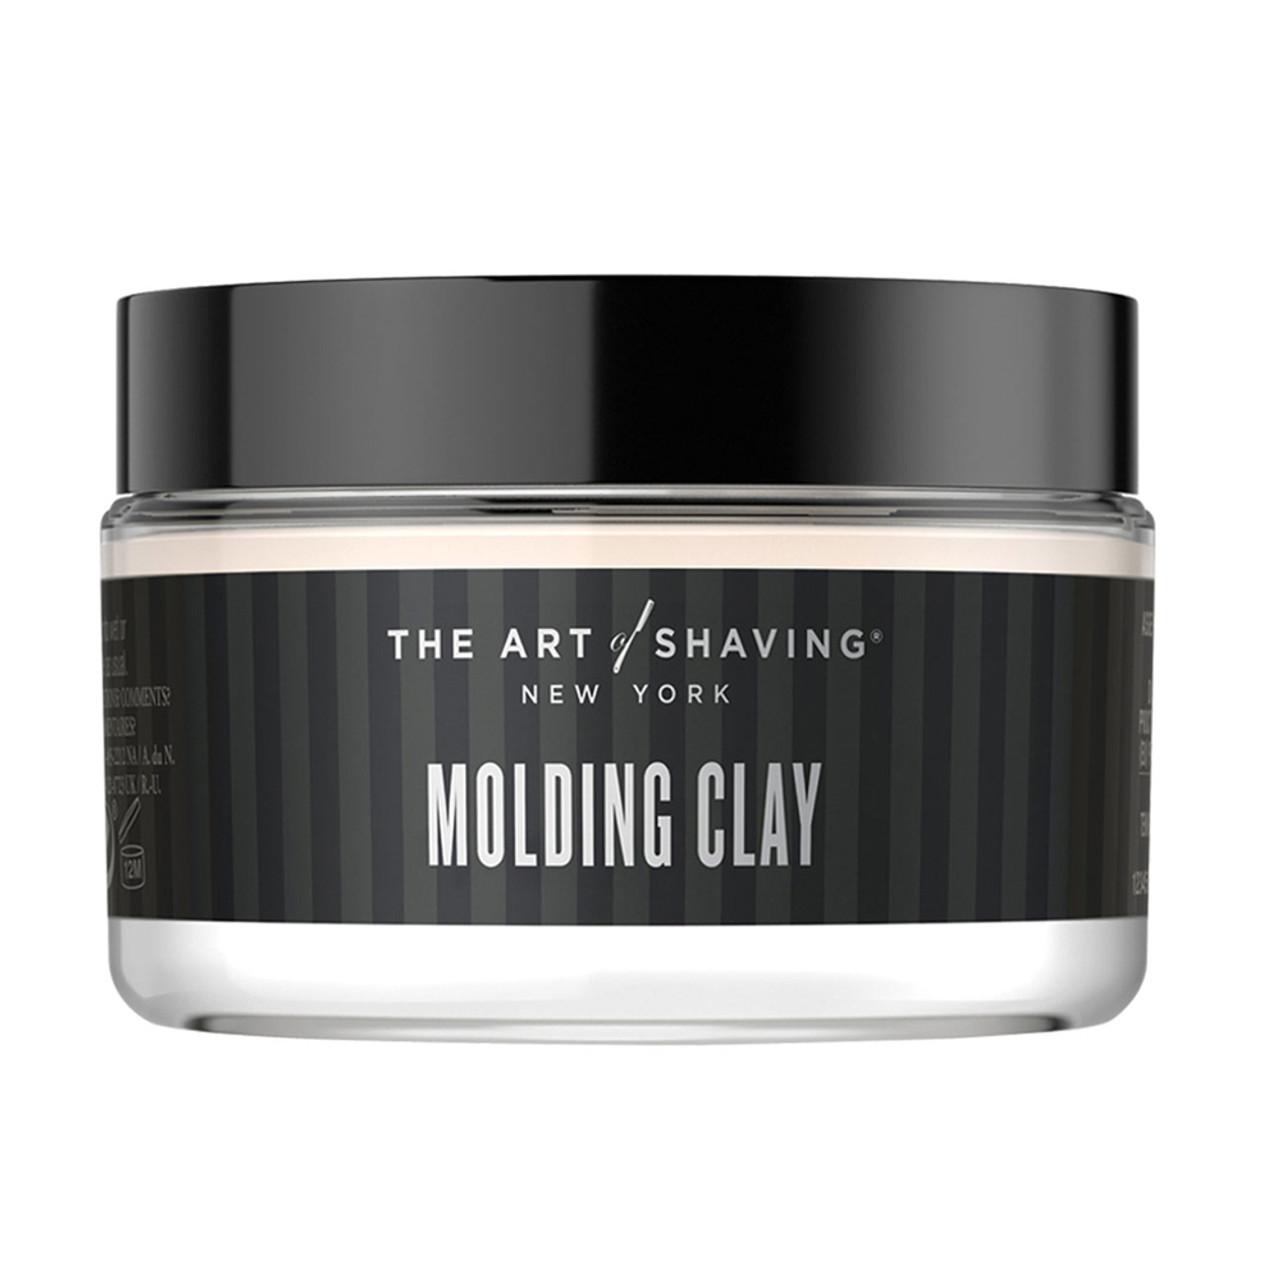 The Art of Shaving Molding Clay BeautifiedYou.com